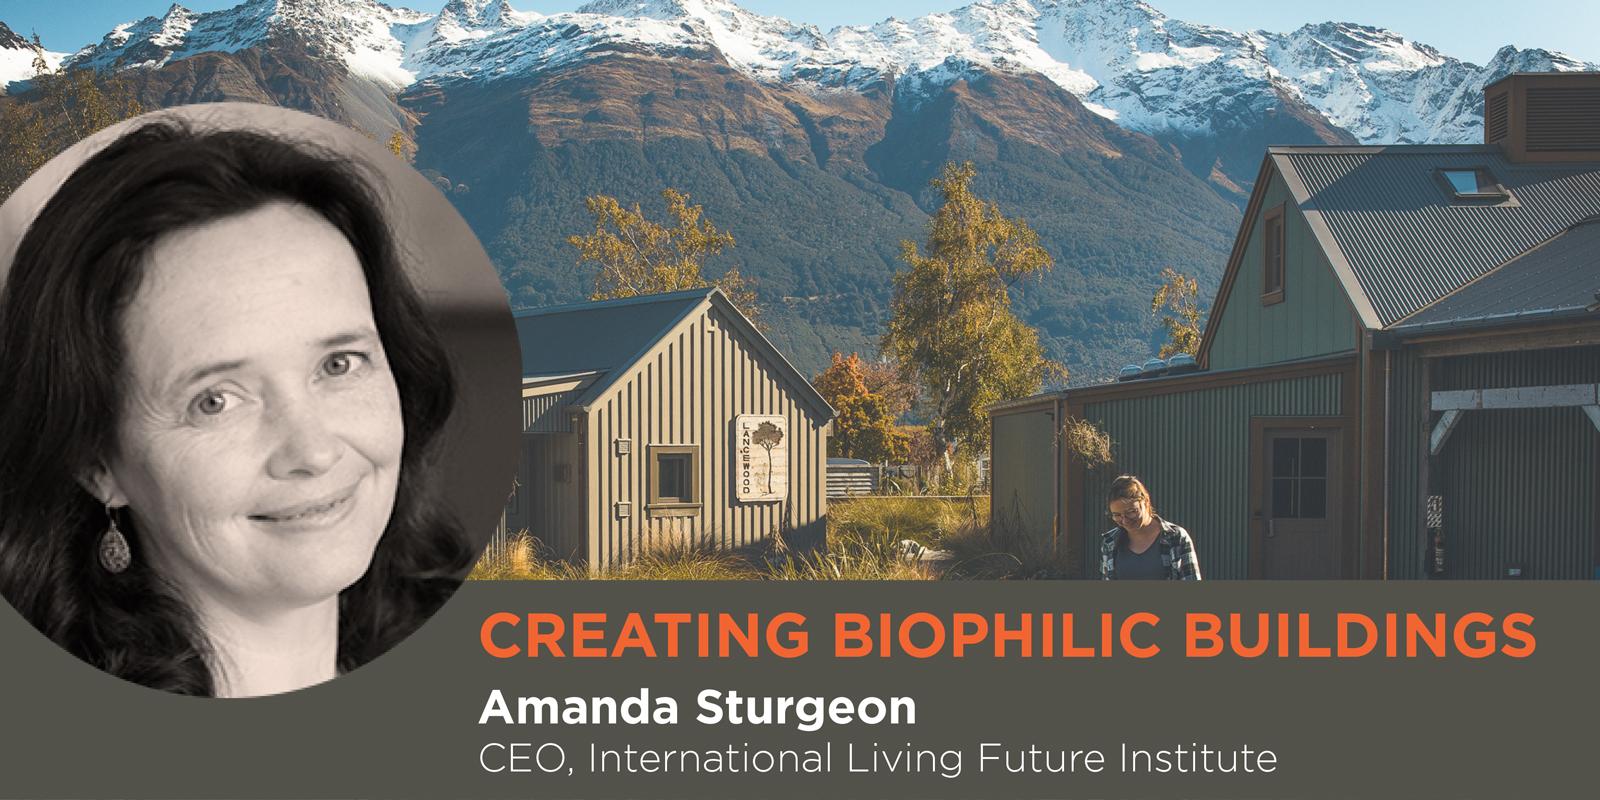 Creating-Biophilic-Buildings-Amanda-Sturgeon-Eventbrite.jpg